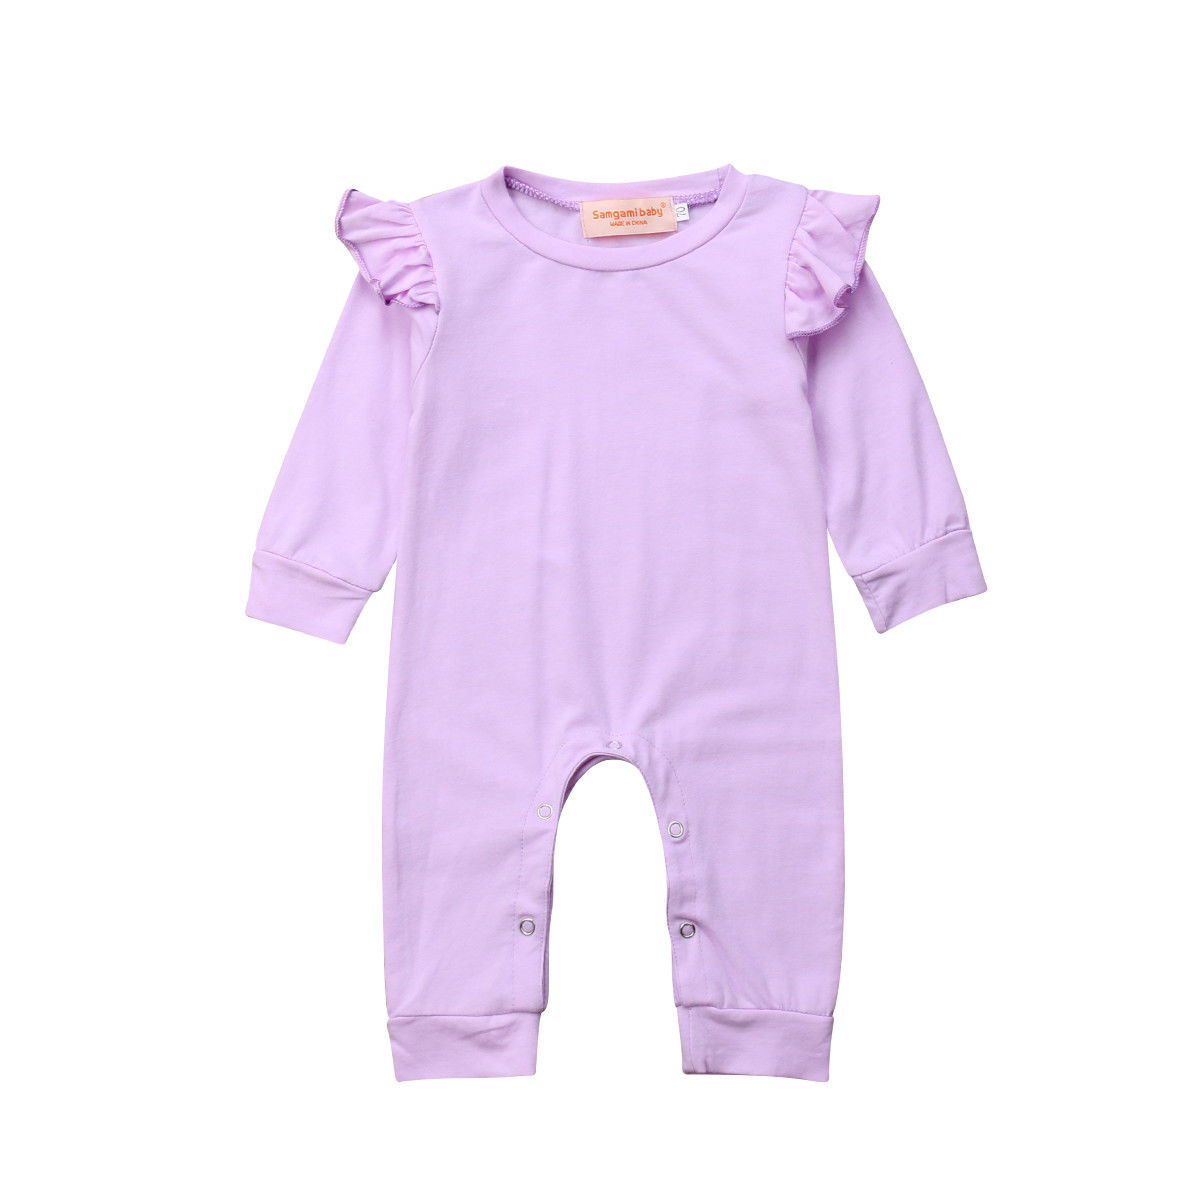 54fe2a5b4 Toddler Newborn Baby Girl Romper Solid Purple Ruffles Long Sleeve Infant  Girls Jumpsuit Playsuit Autumn Baby Girl Clothing | AMAZINGSTORE4U